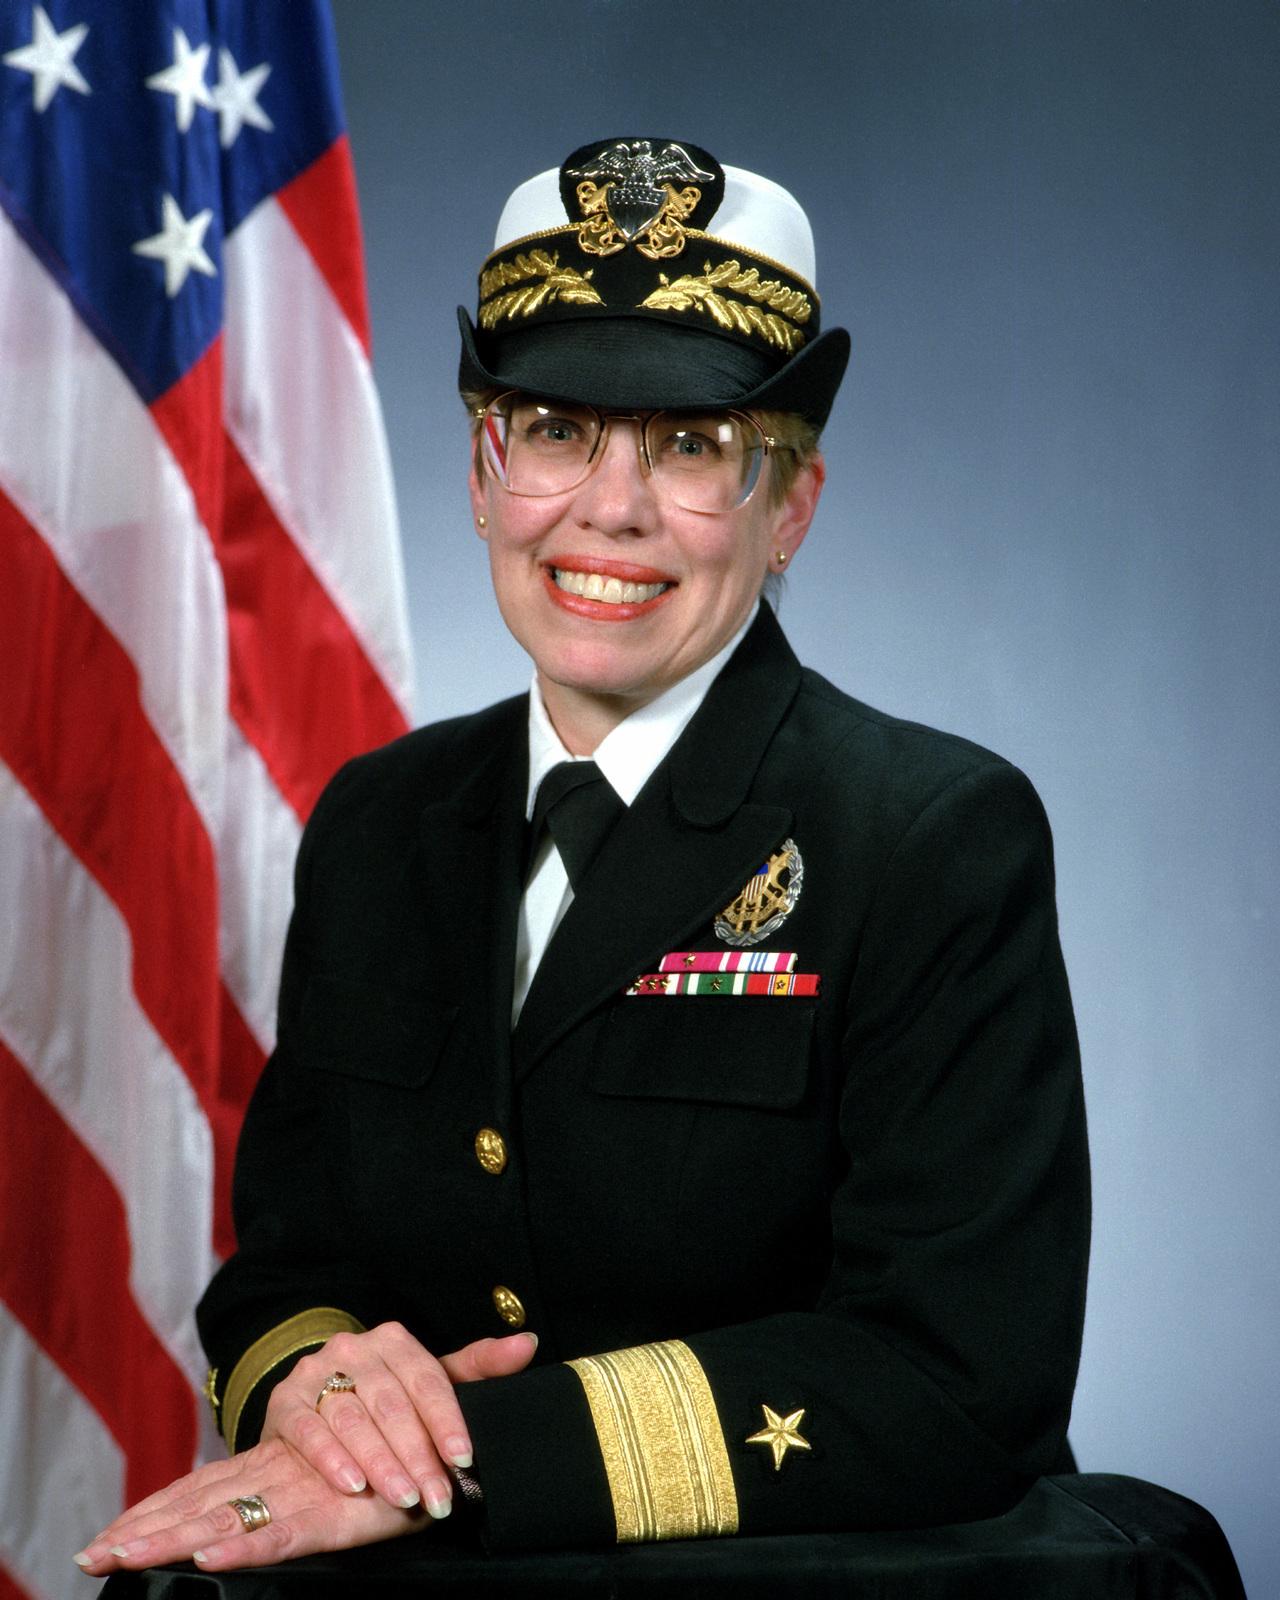 Rear Admiral (lower half) Katherine L. Laughton, USN